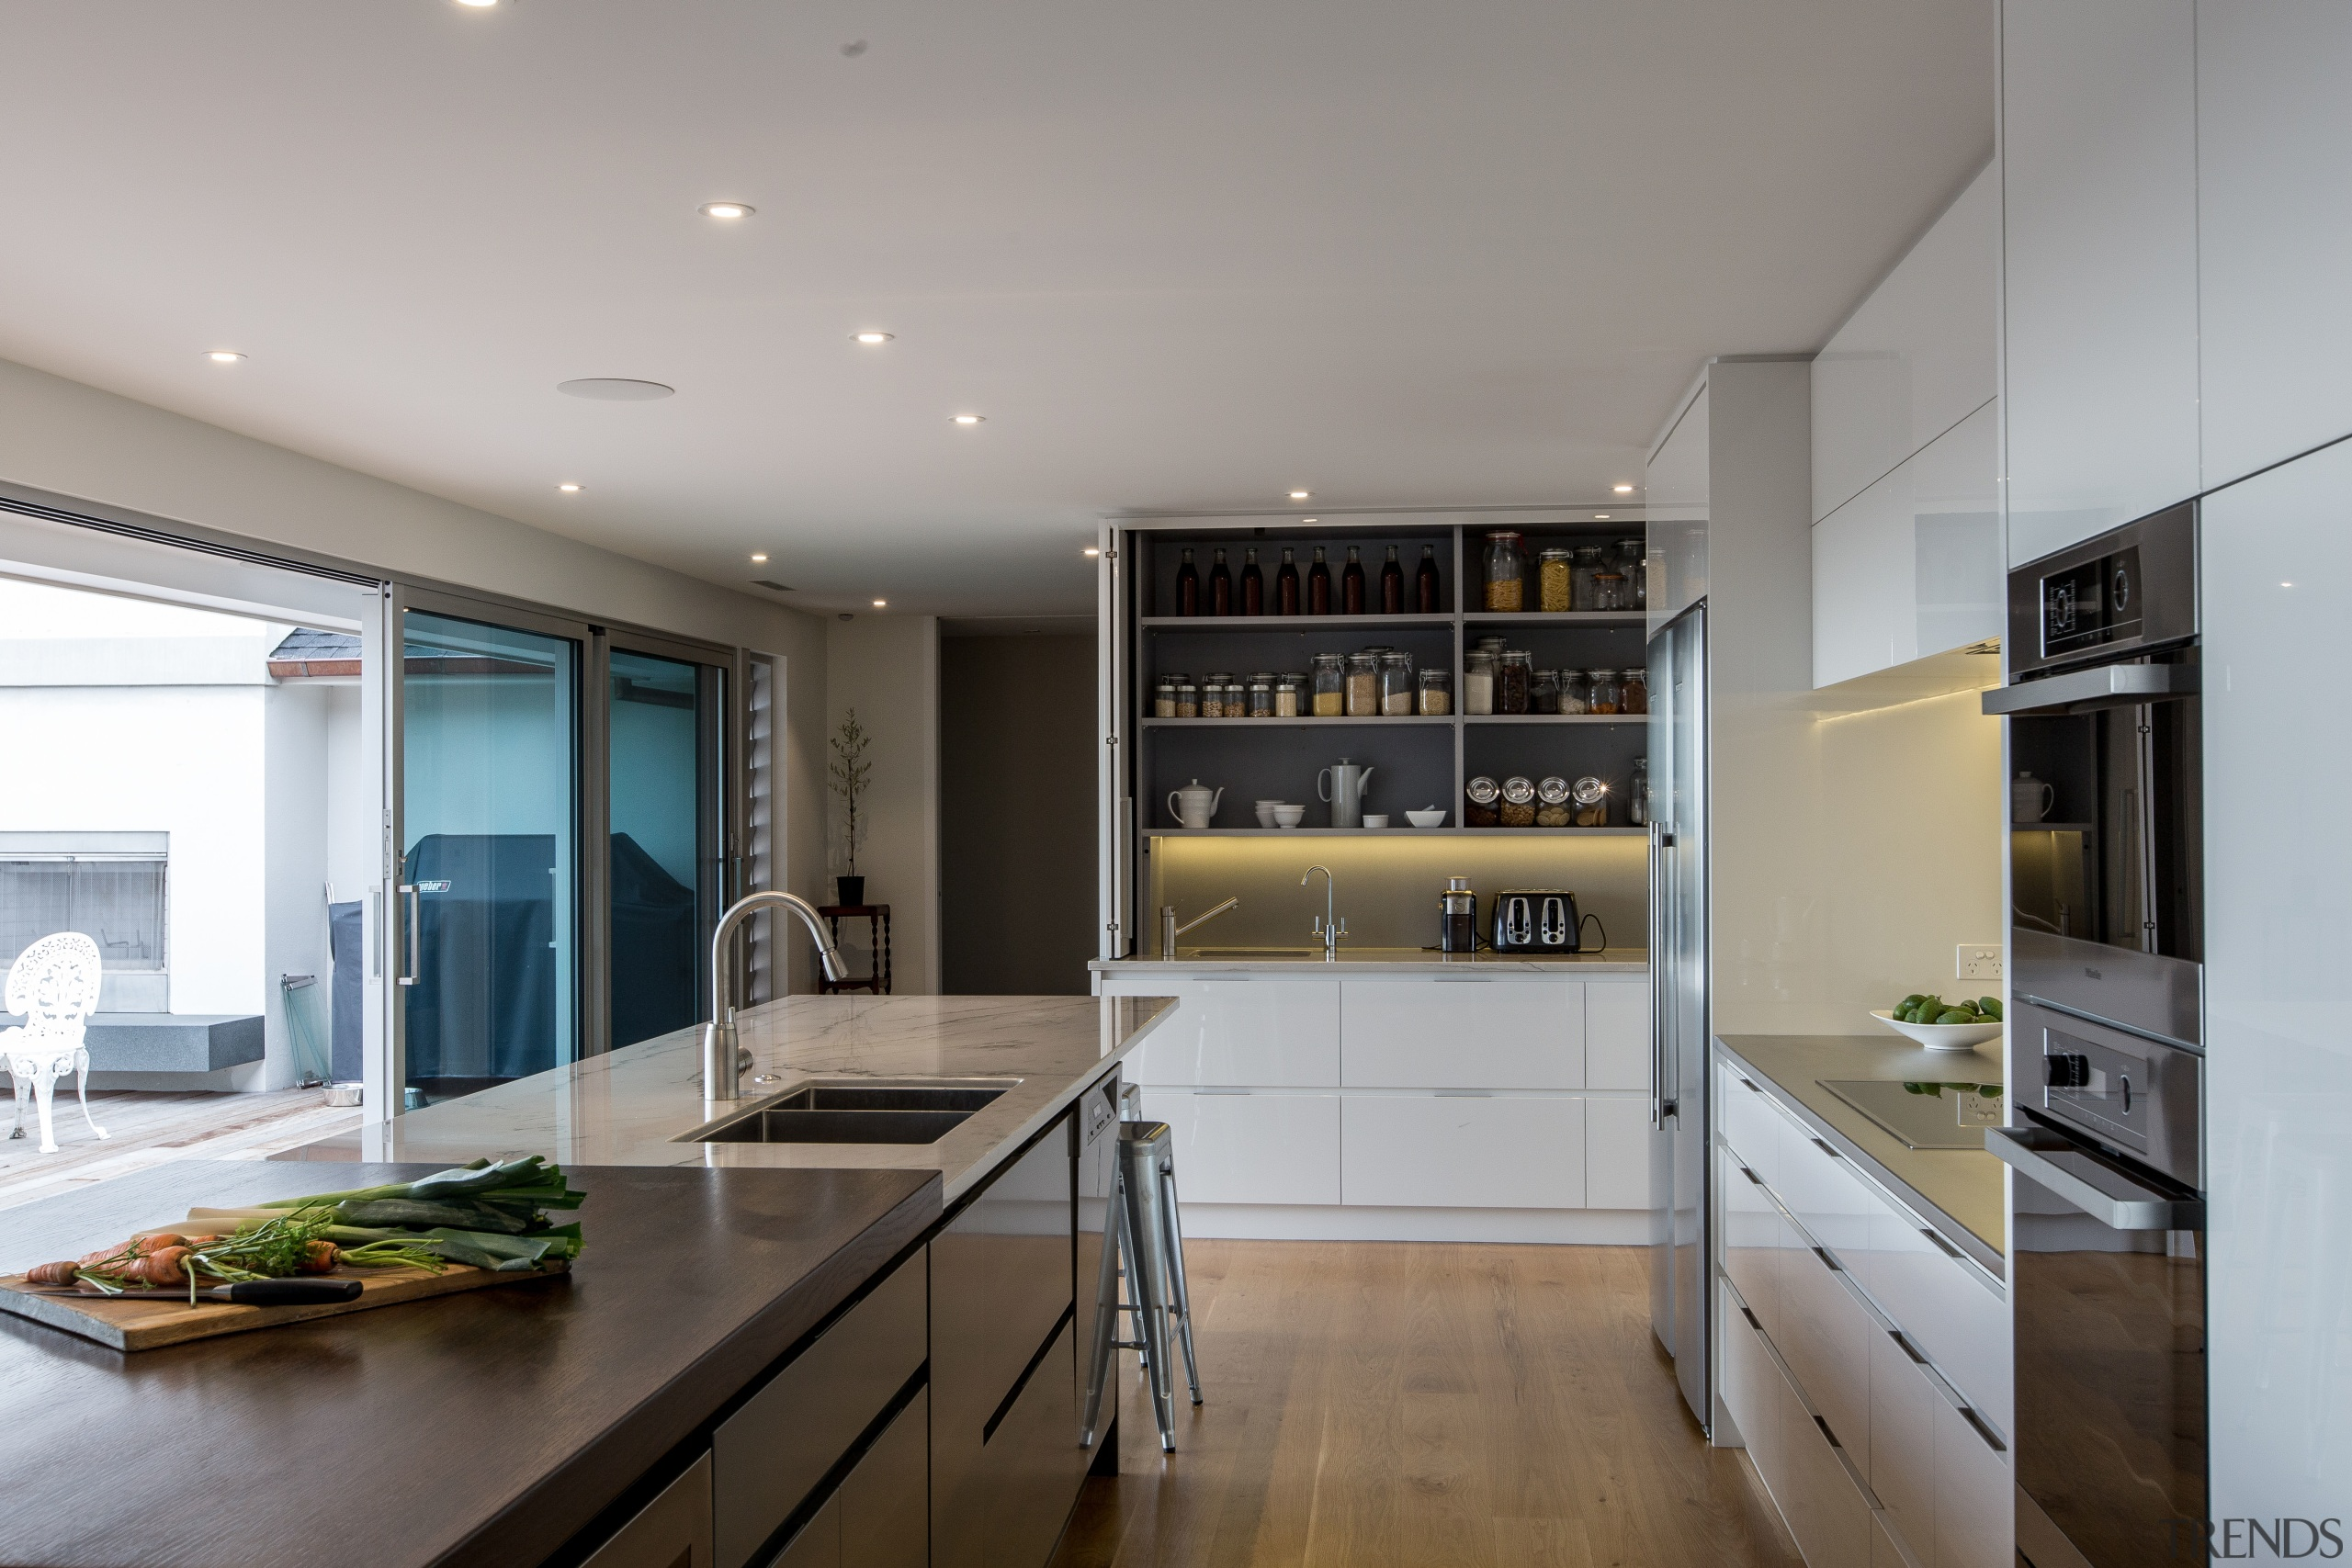 Cabinetry is in Resene Half Merino and Resene cabinetry, countertop, cuisine classique, interior design, kitchen, real estate, gray